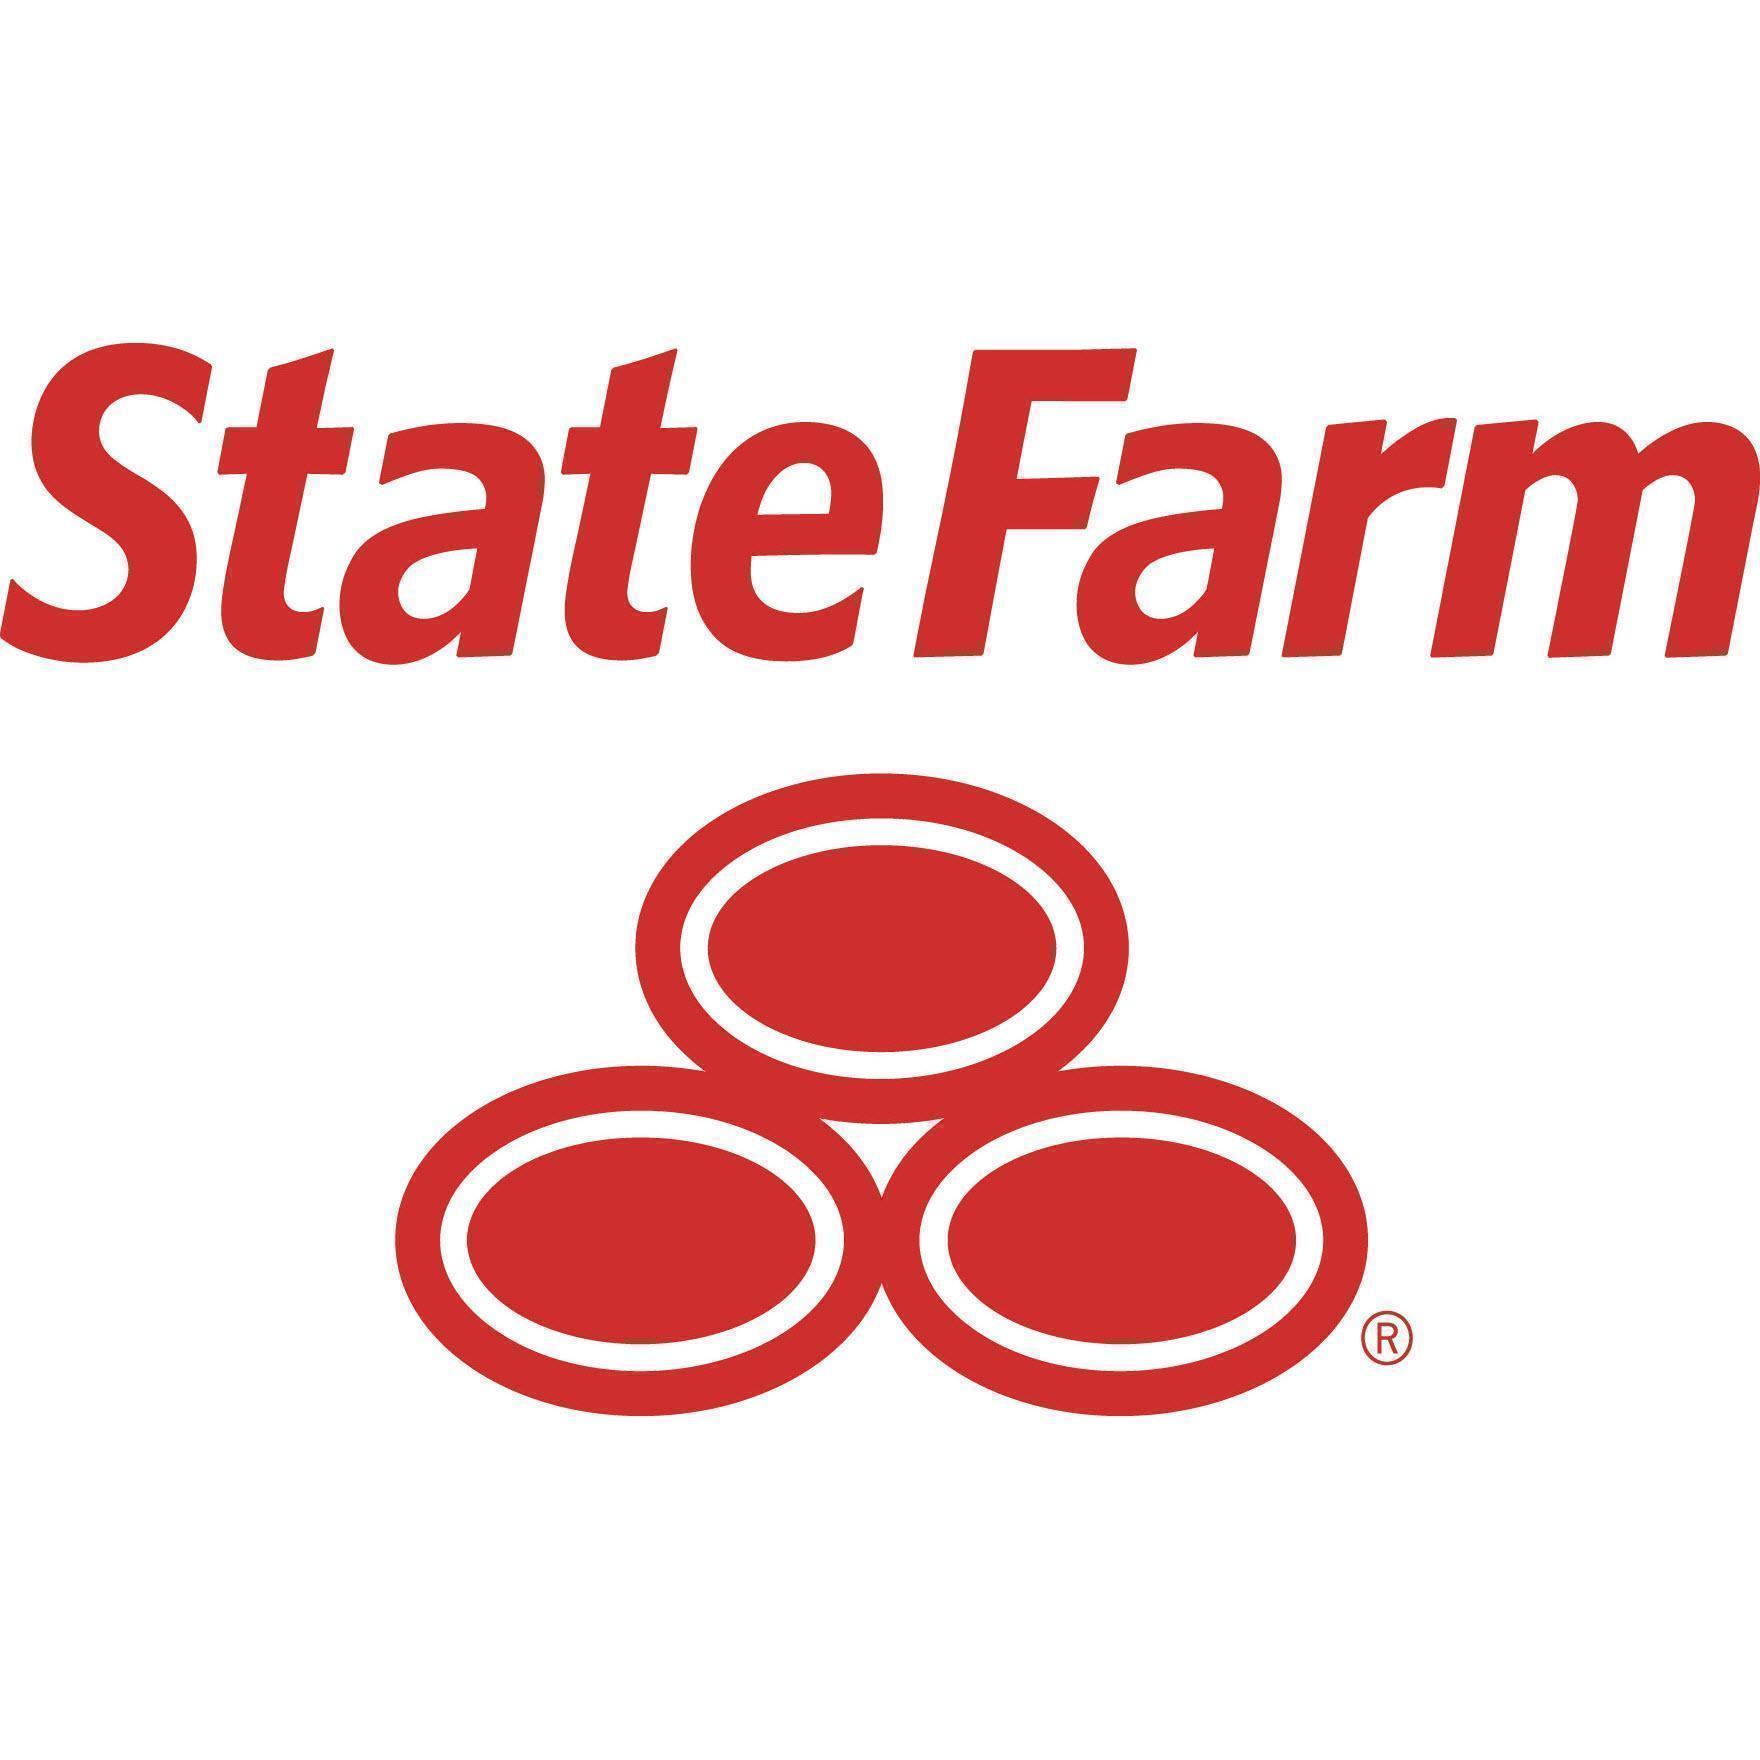 Edward Carrillo - State Farm Insurance Agent